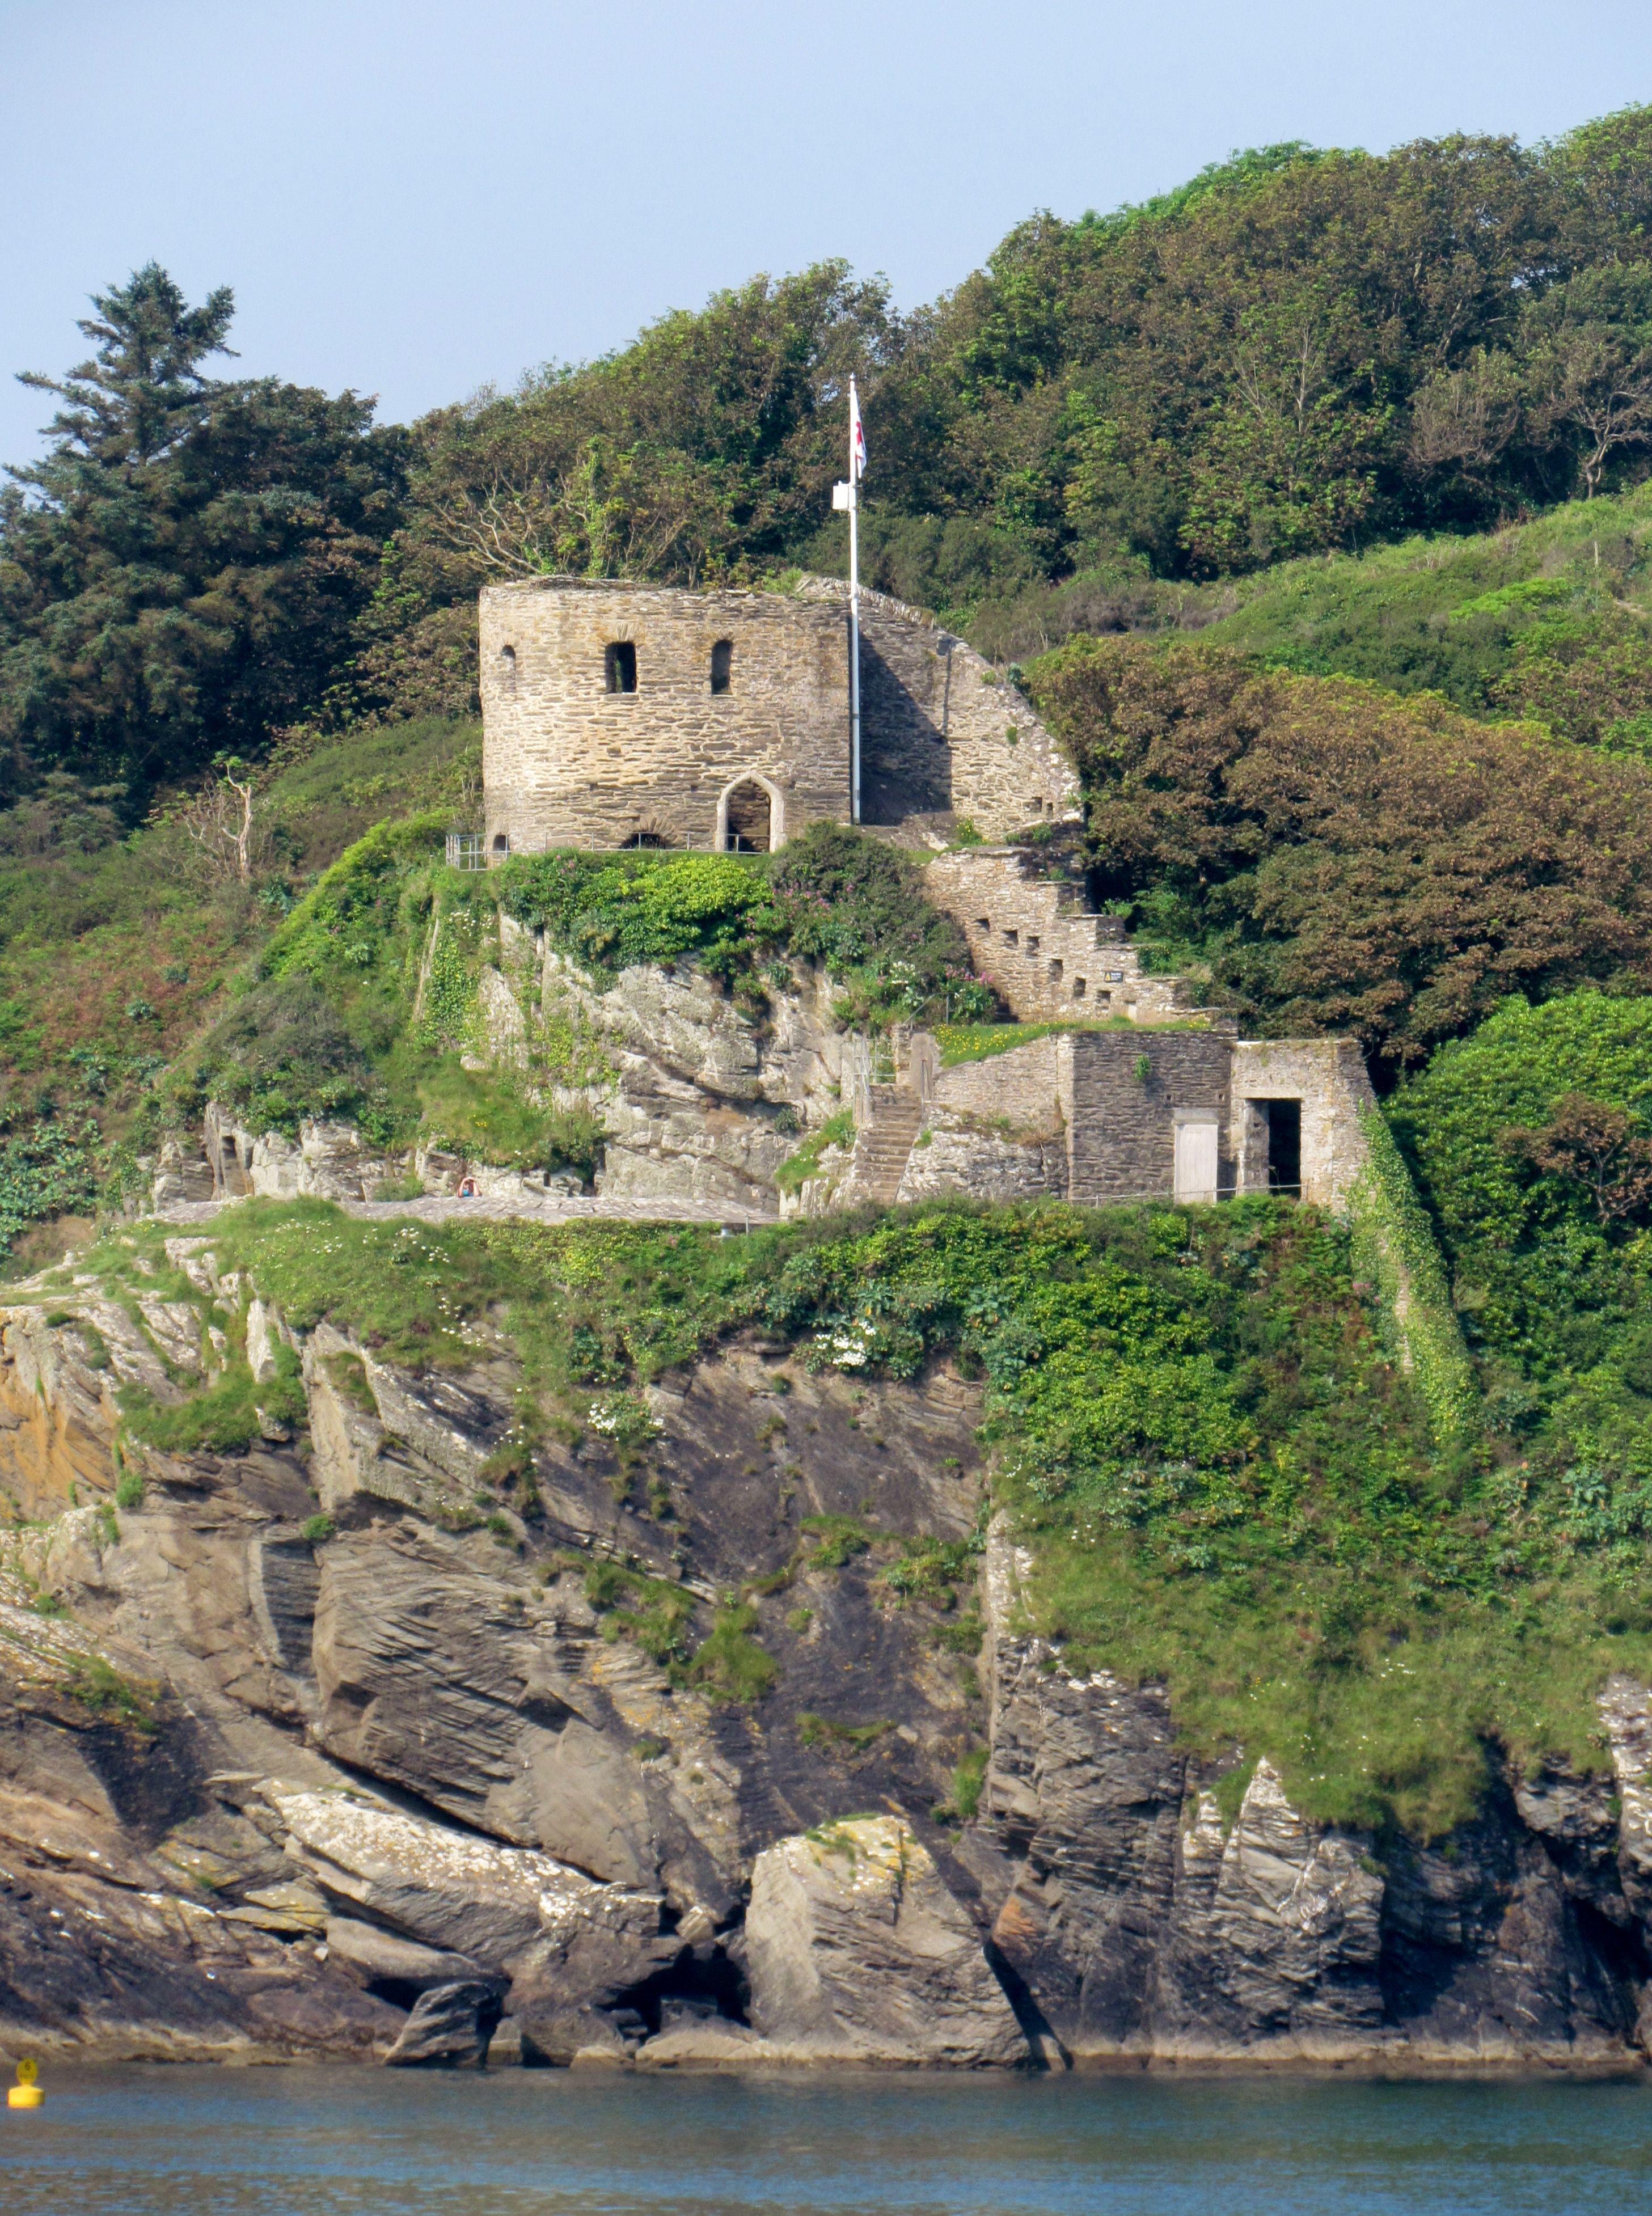 Polridmouth Cove European castles, Cornwall england